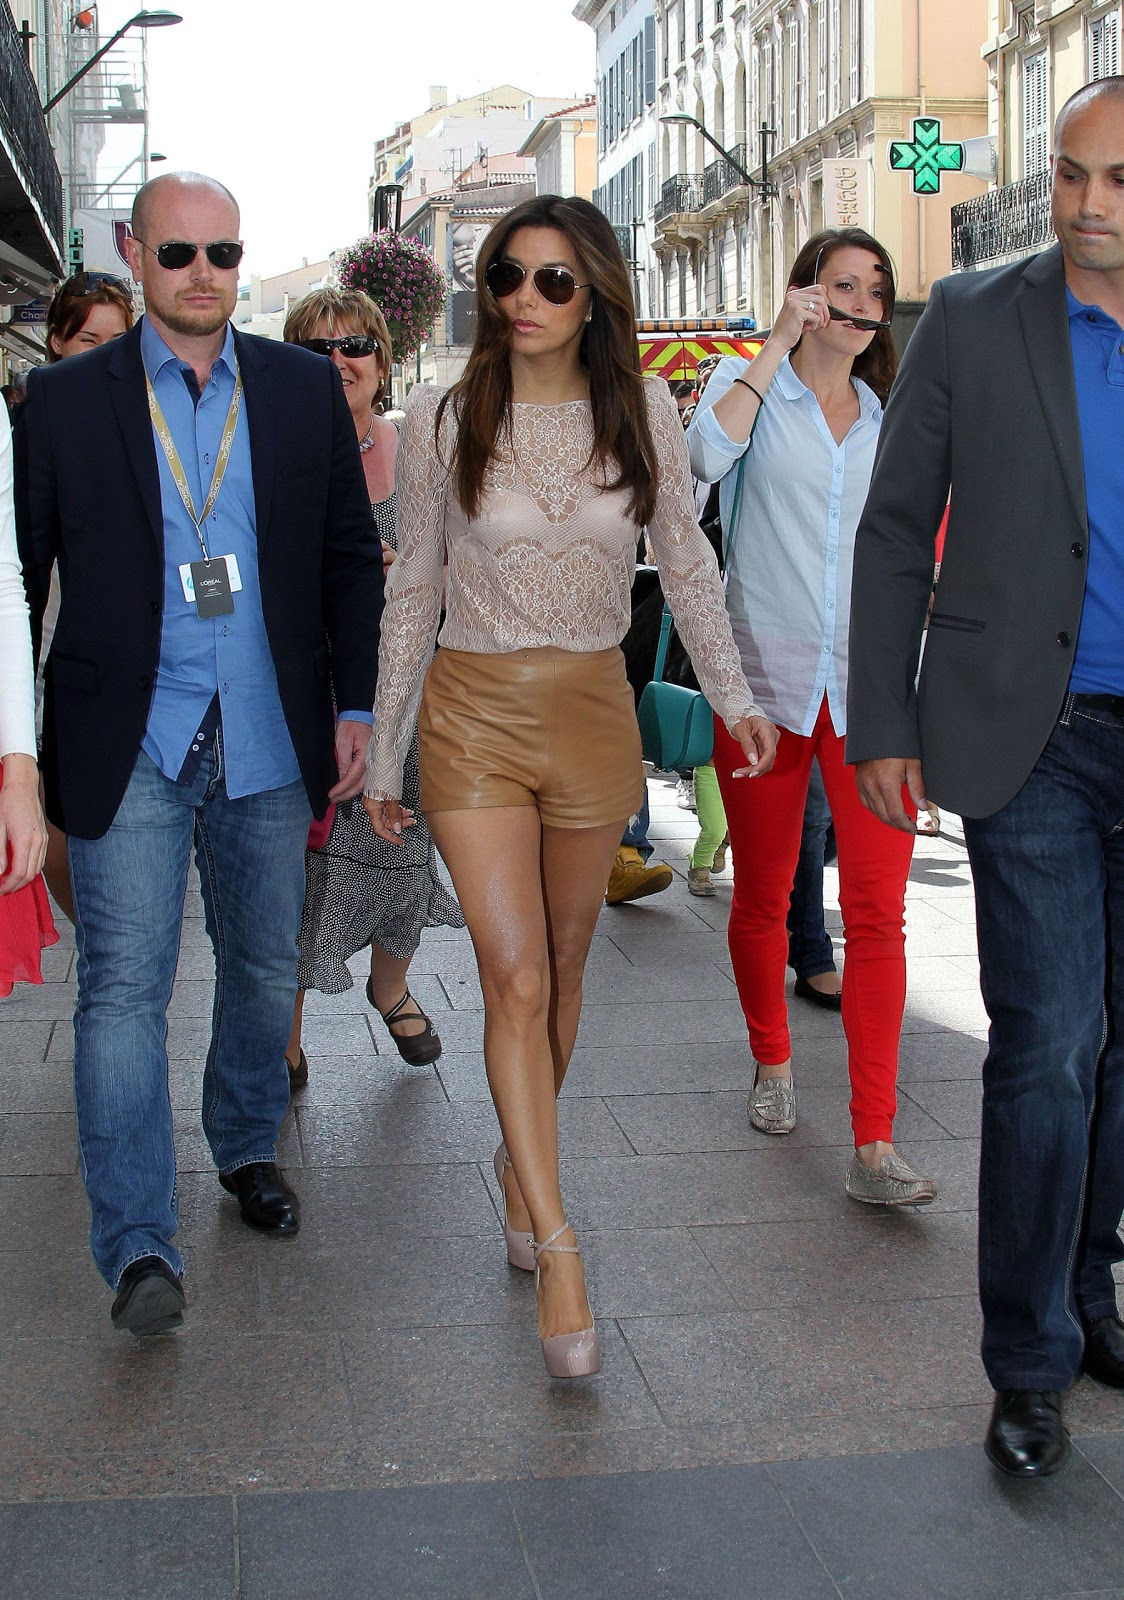 http://4.bp.blogspot.com/-zE5cDbRDfMk/T7eflbitzHI/AAAAAAAAFxA/Ngcj6RsyvdM/s1600/celebrity-EVA-LONGORIA-Out-and-About-in-Cannes-2012-02.jpg